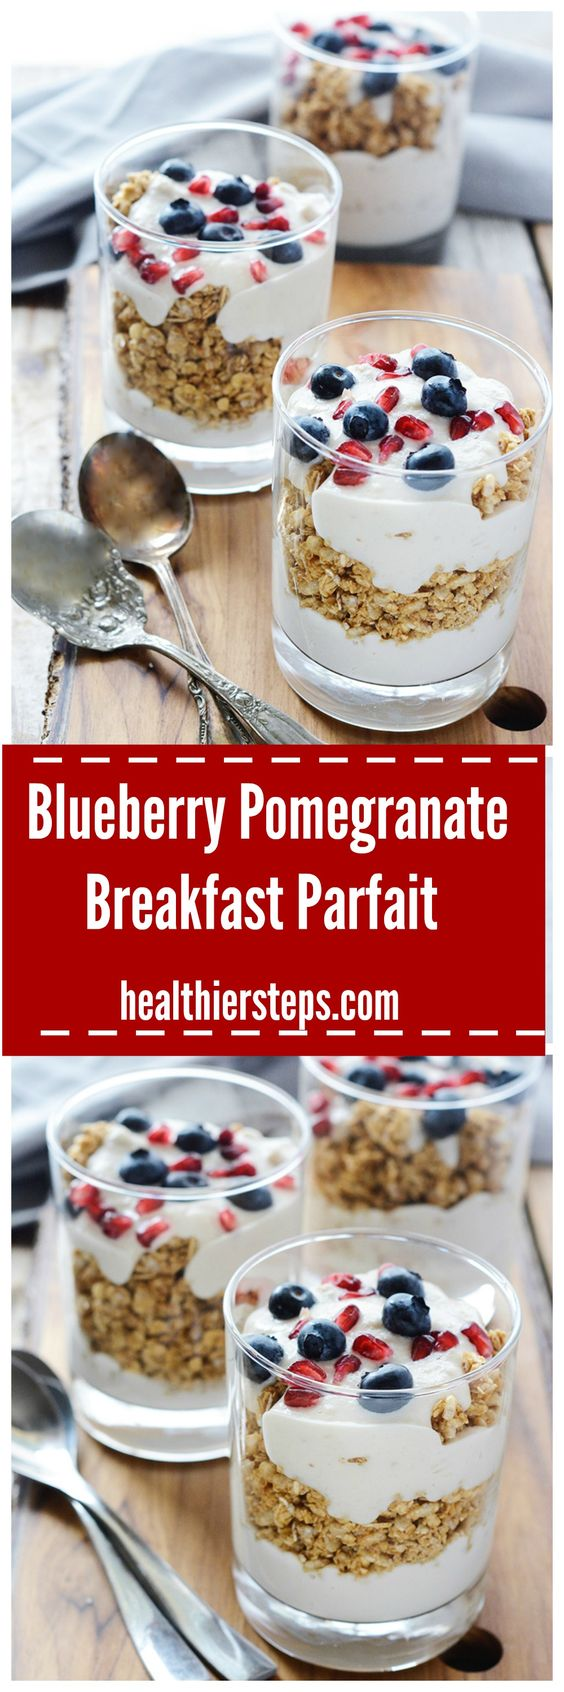 Blueberry Pomegranate Breakfast Parfait